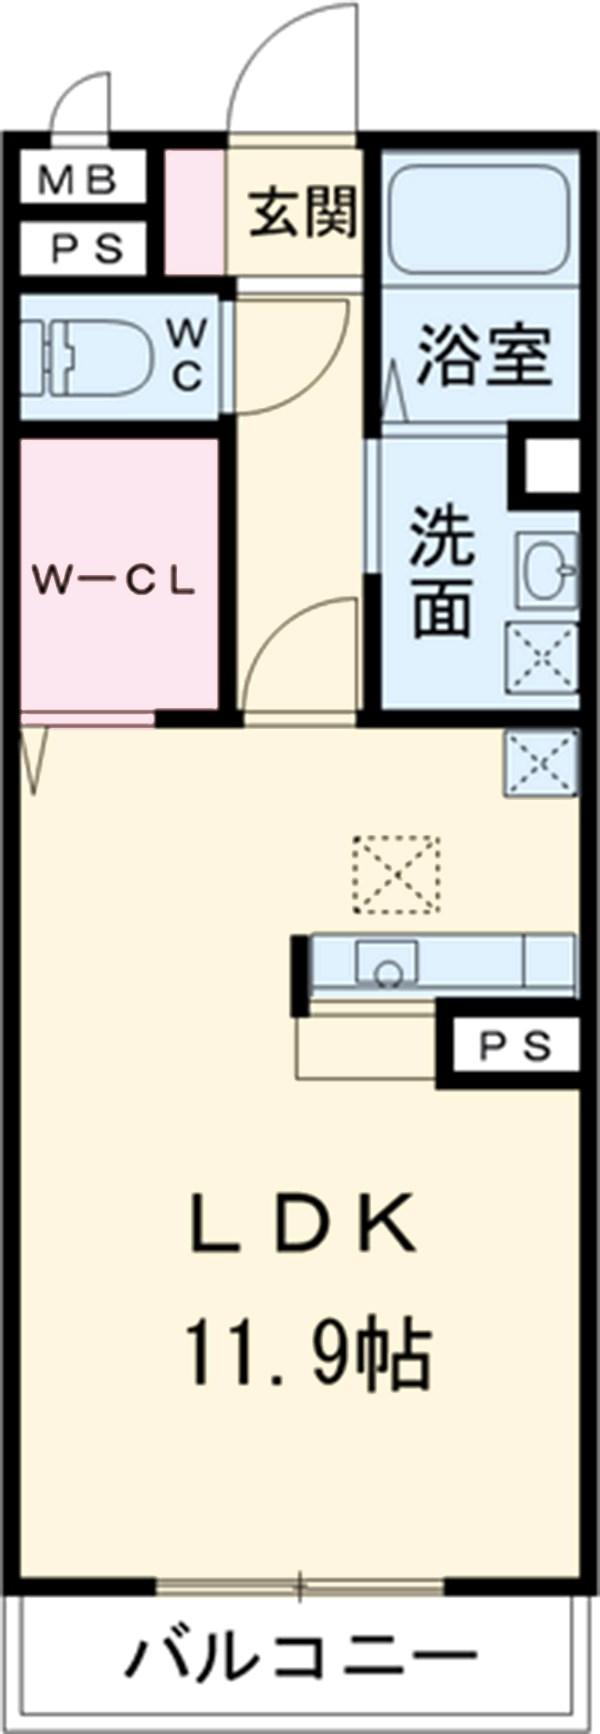 D-roomサンヒルズ B 207号室の間取り